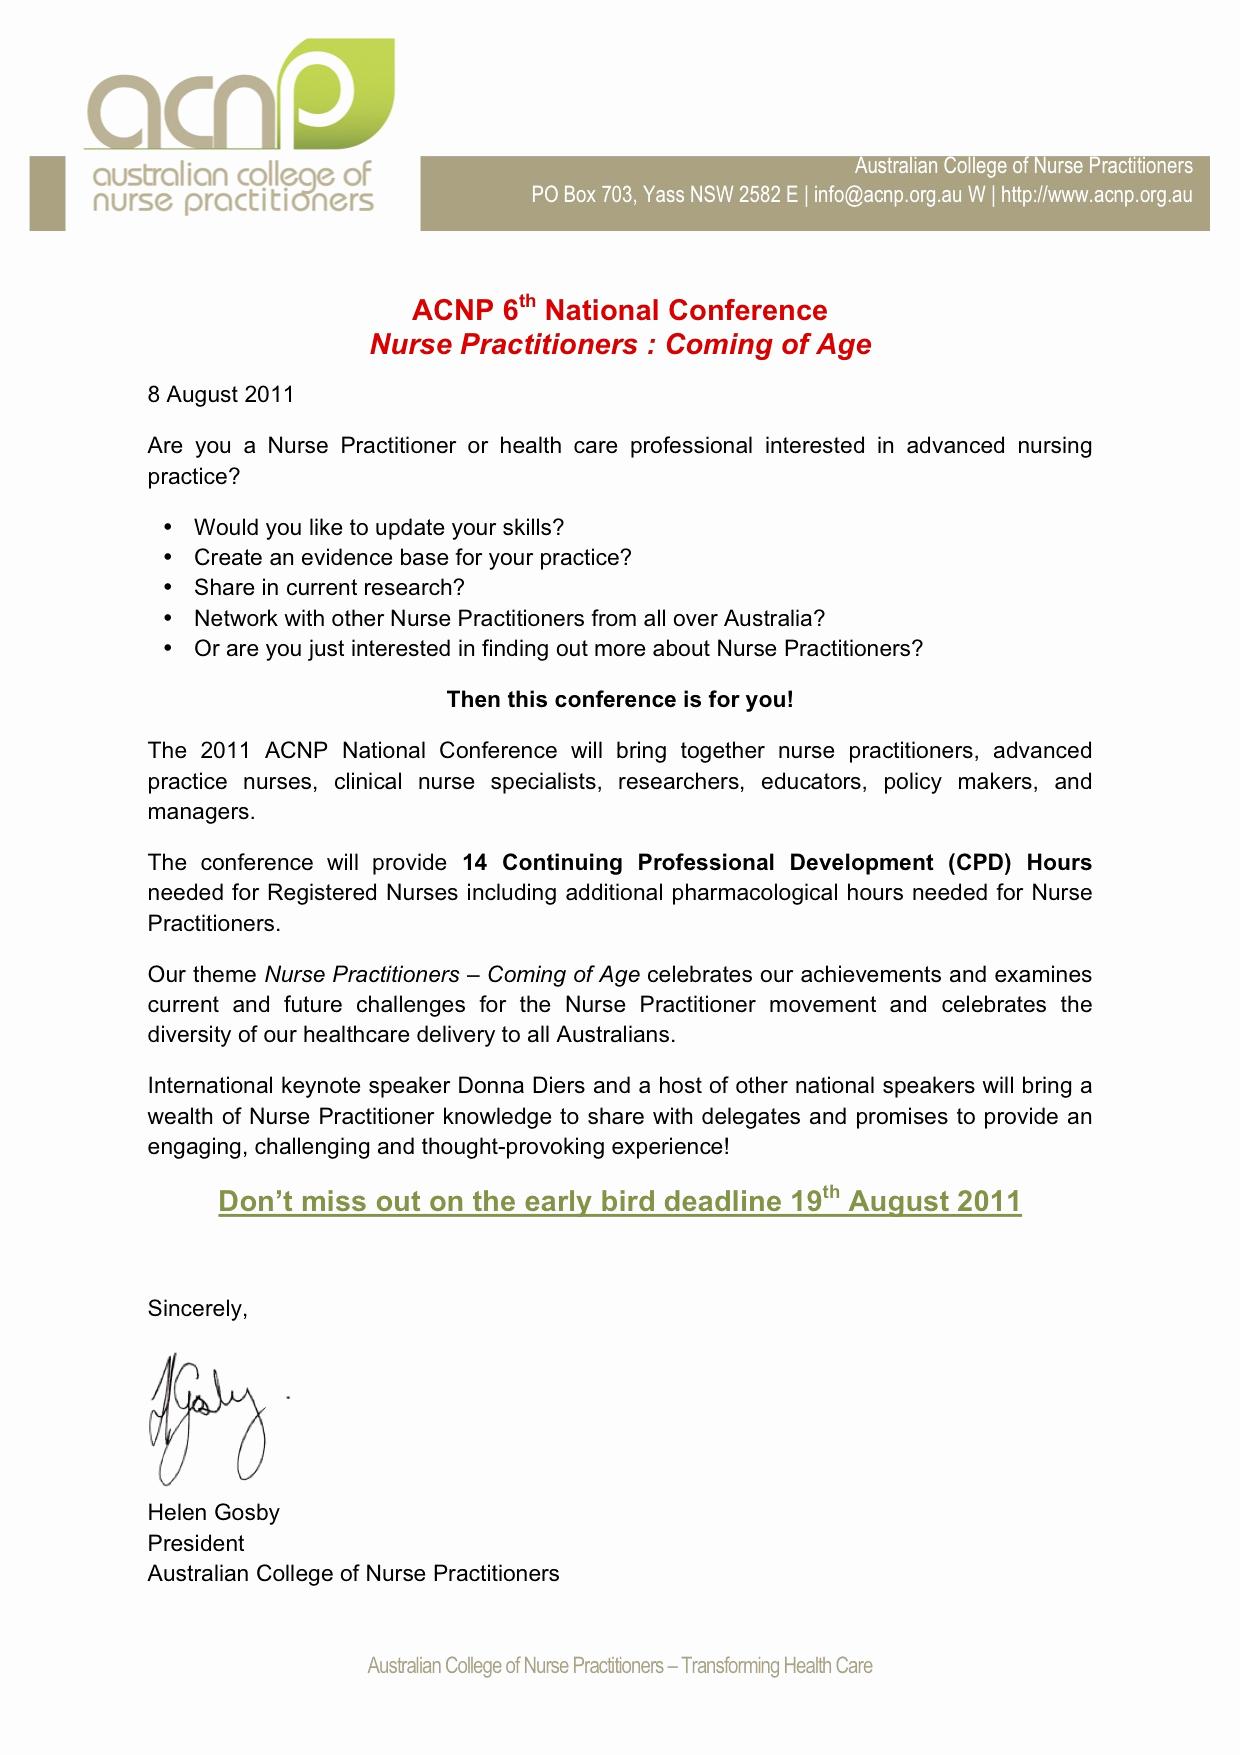 Invitation Letter for Speaker Beautiful Australian College Of Nurse Practitioners 2011 National